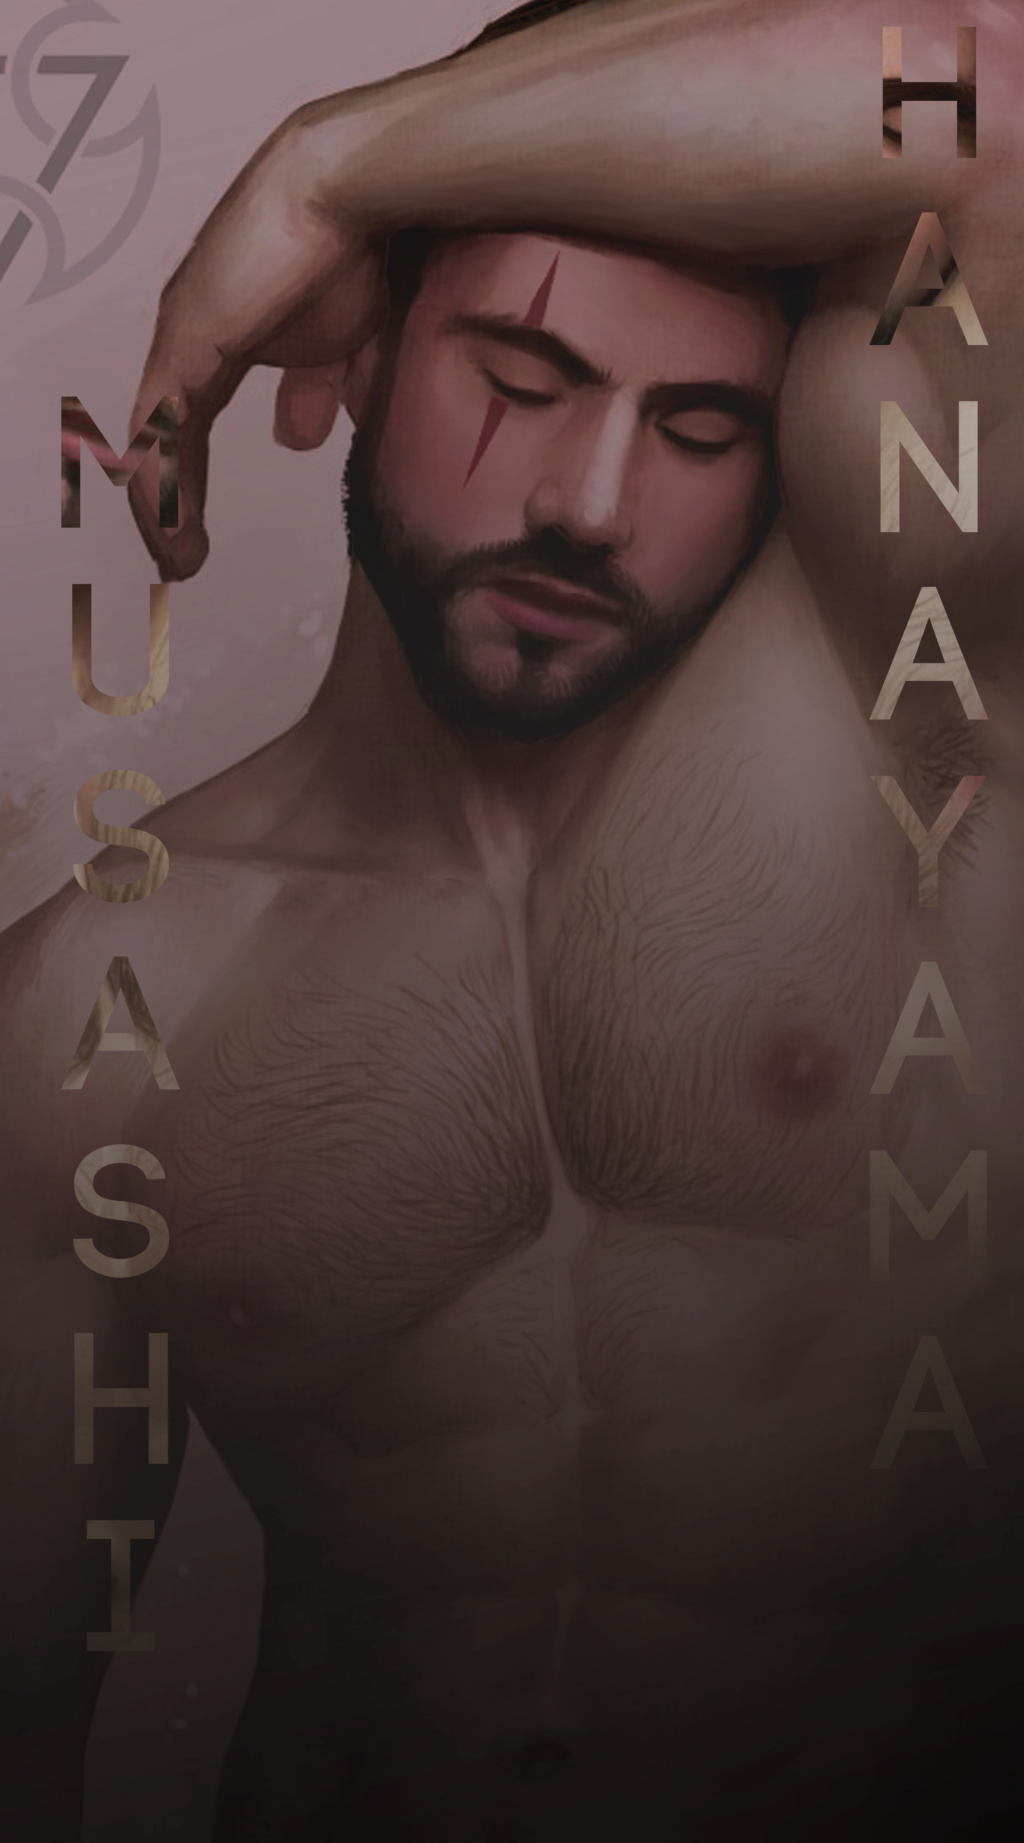 Musashi Hanayama